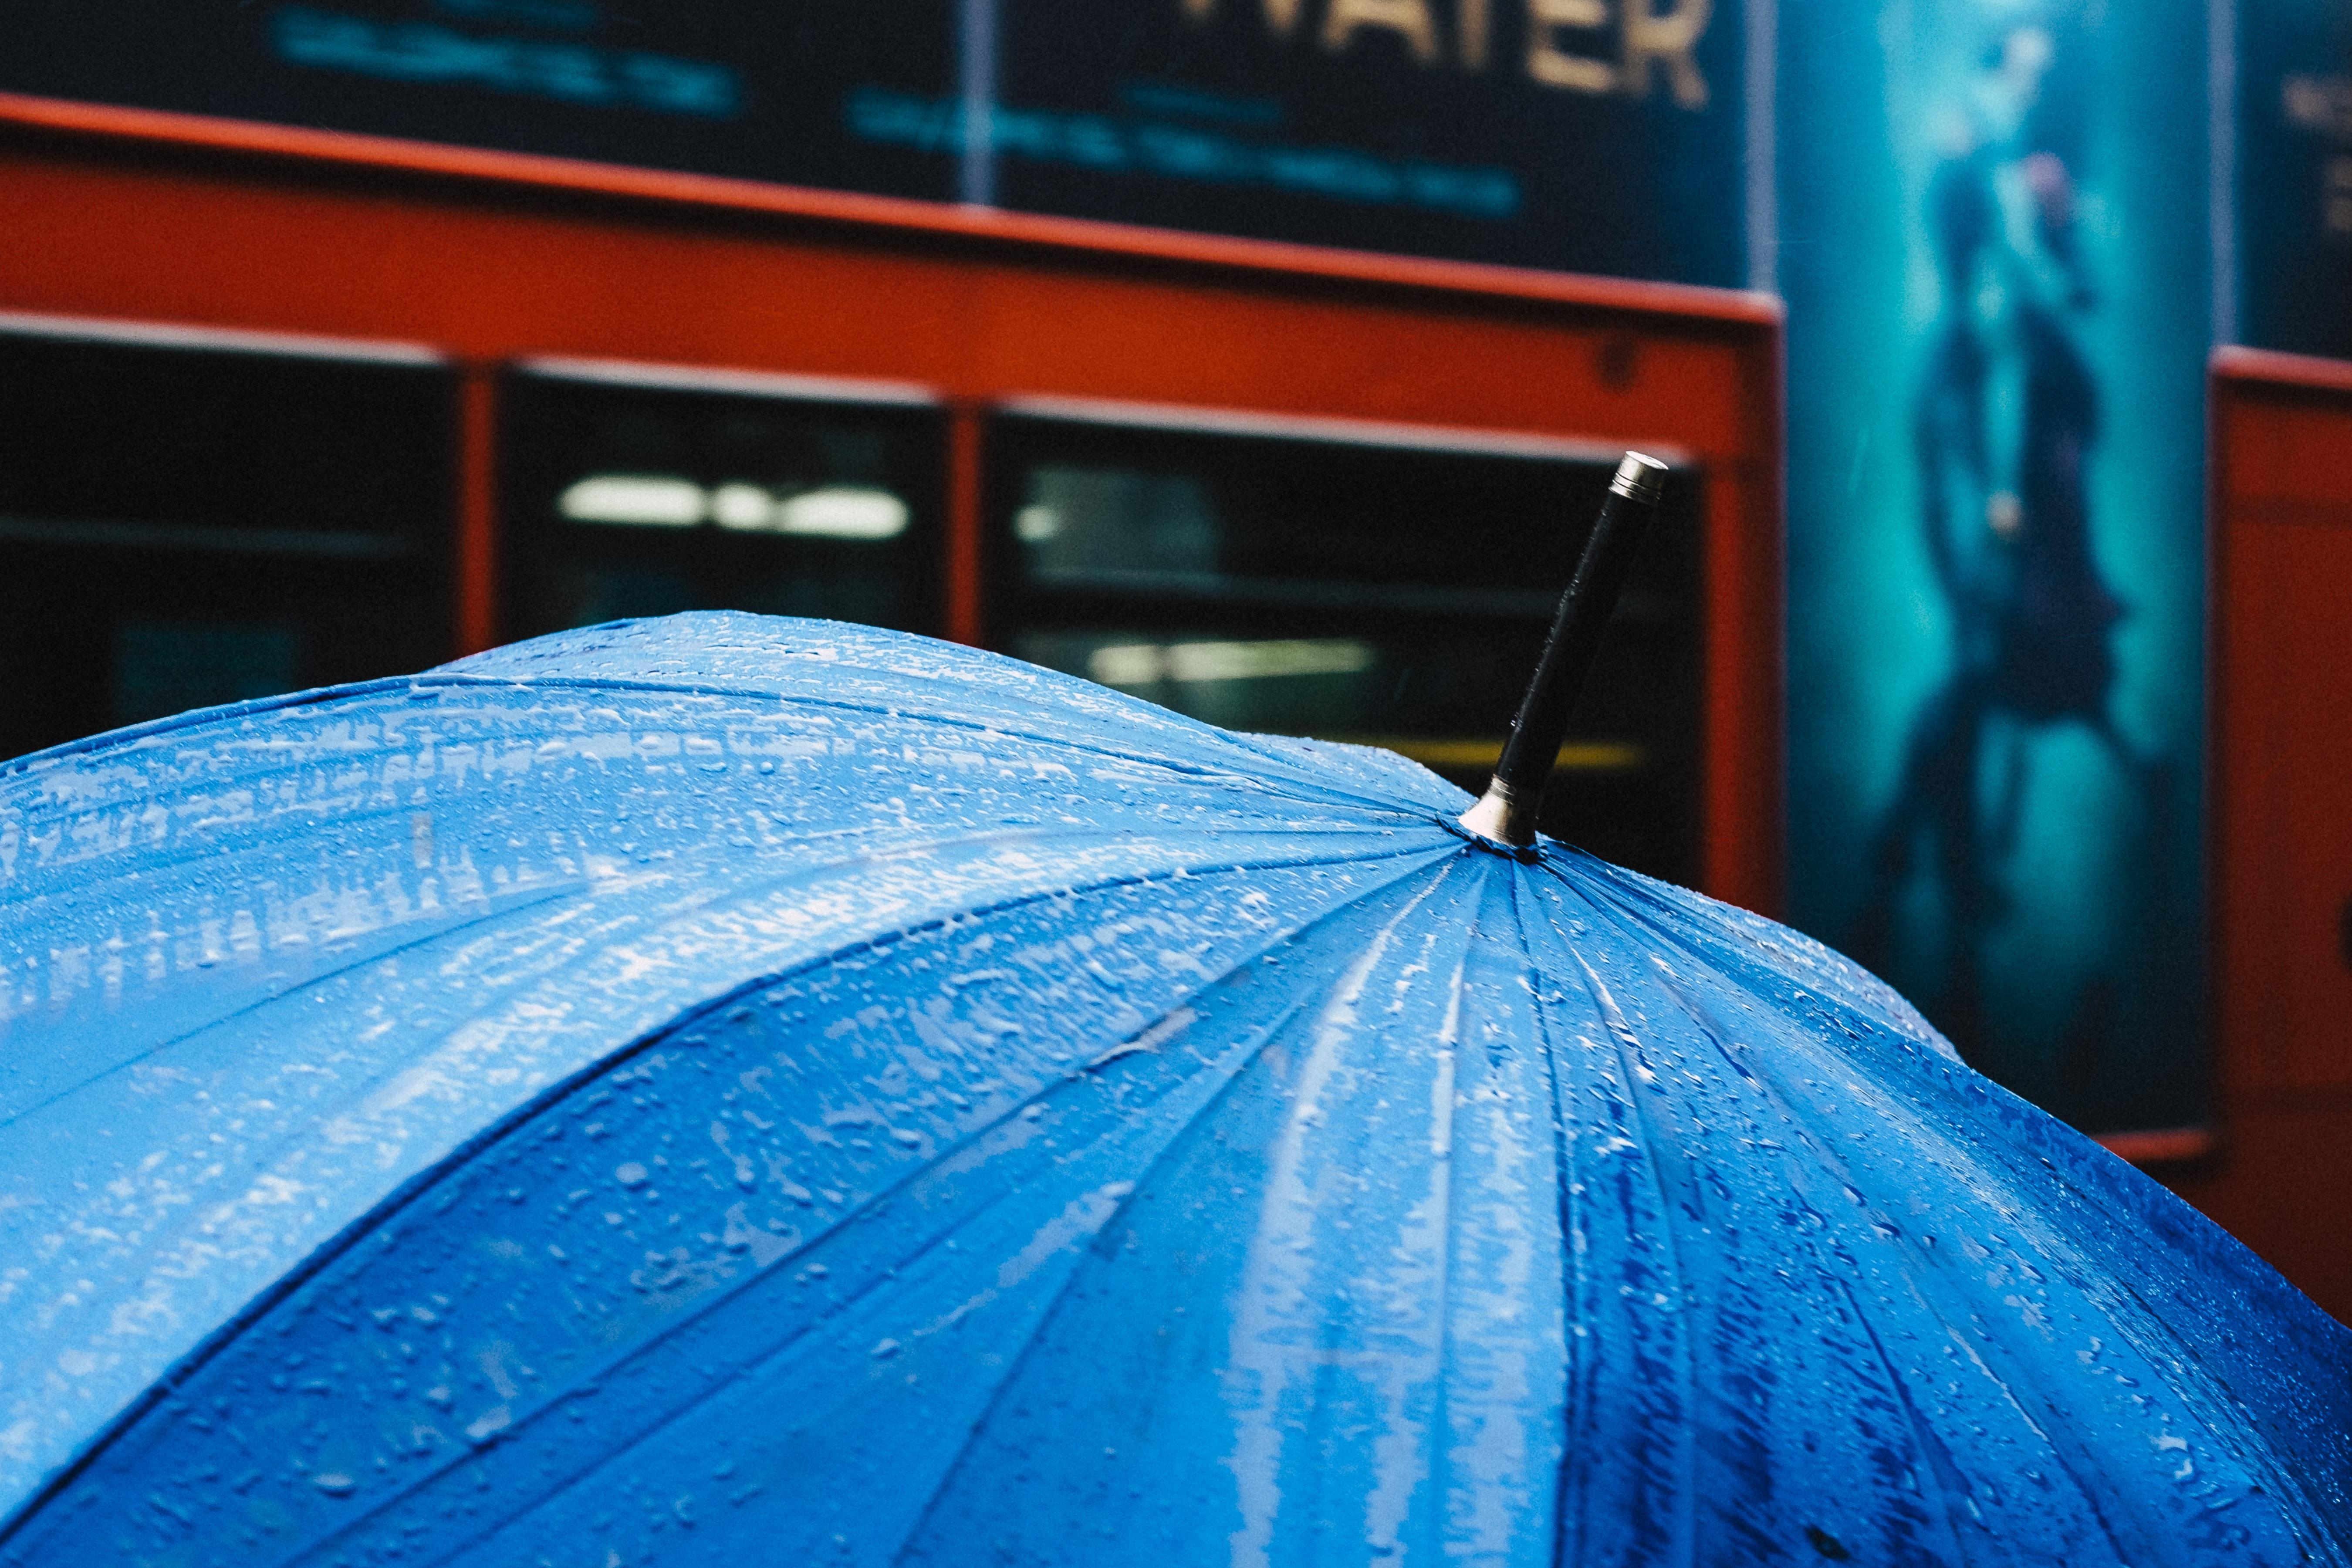 selective focus photography of blue umbrella